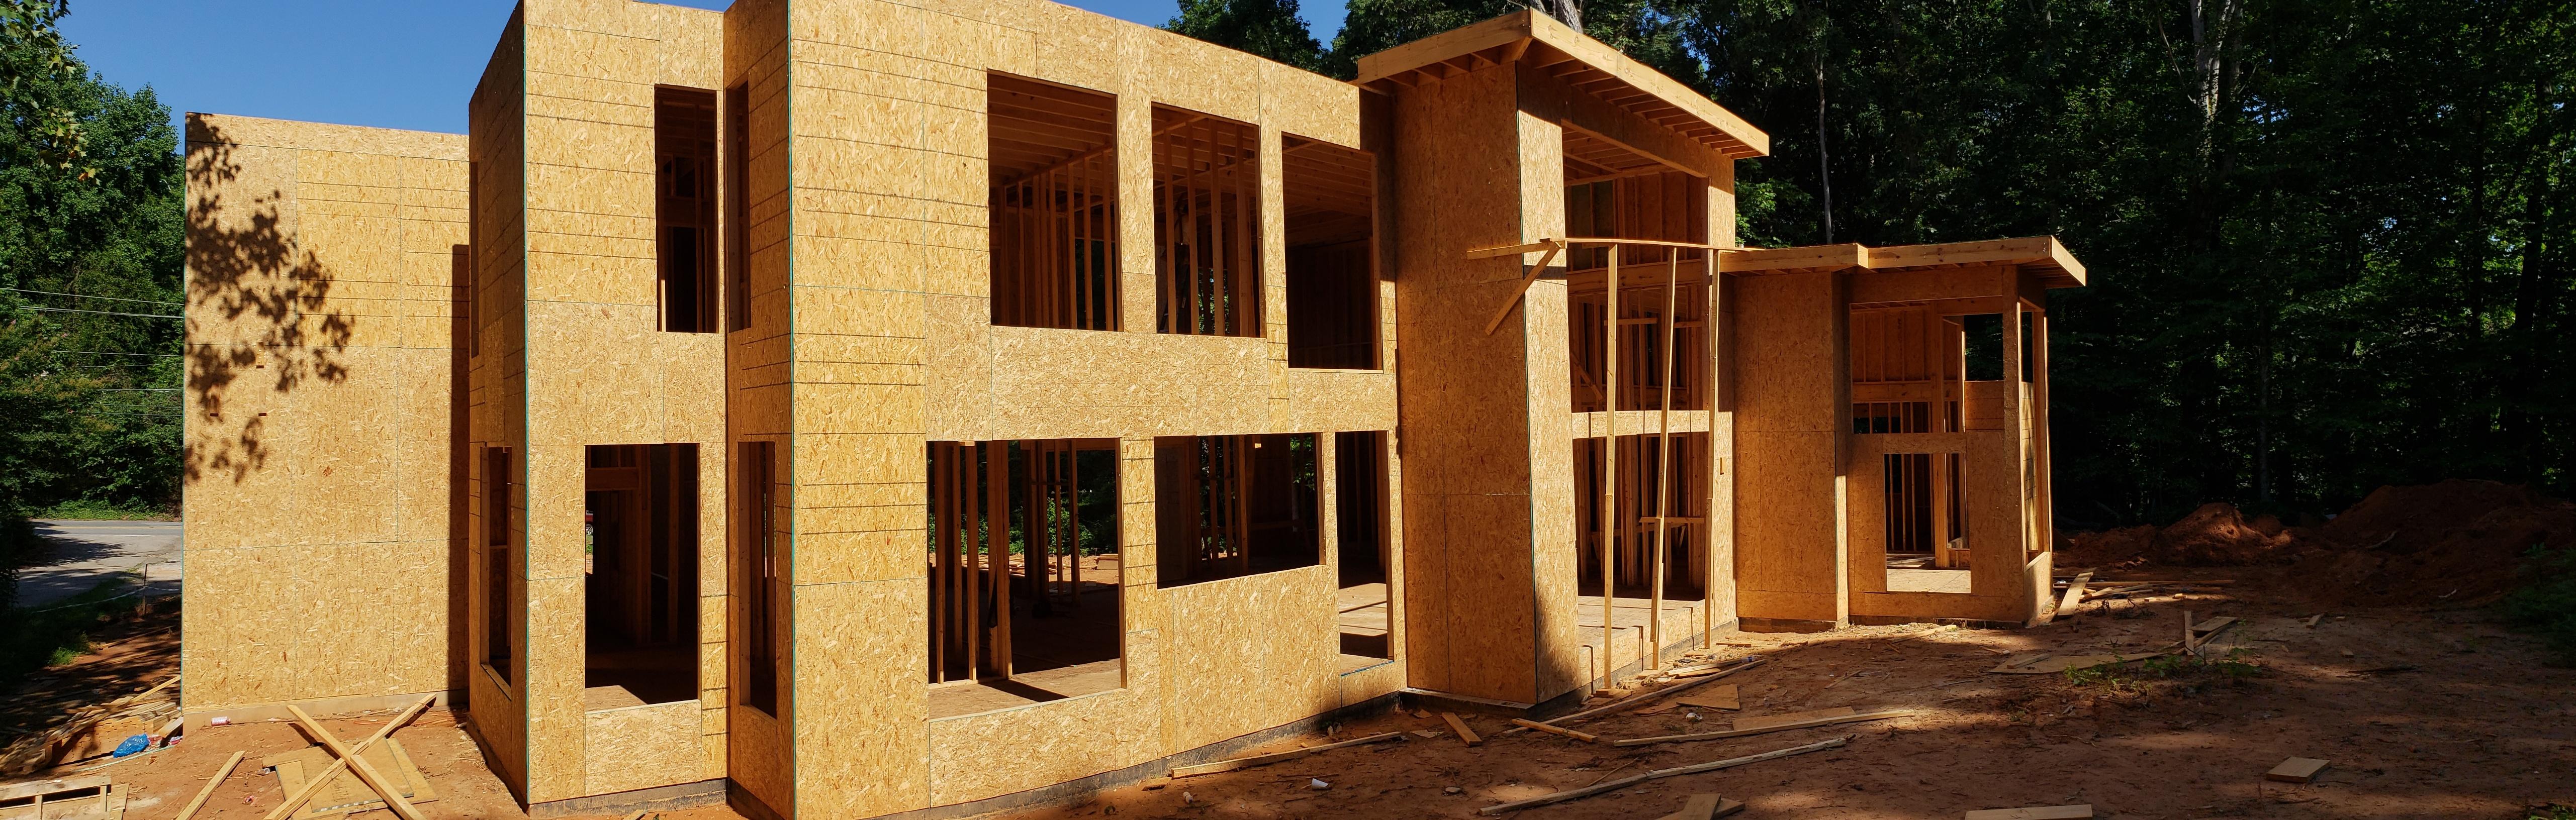 Sarsaparilla House Plan - Atlanta, GA